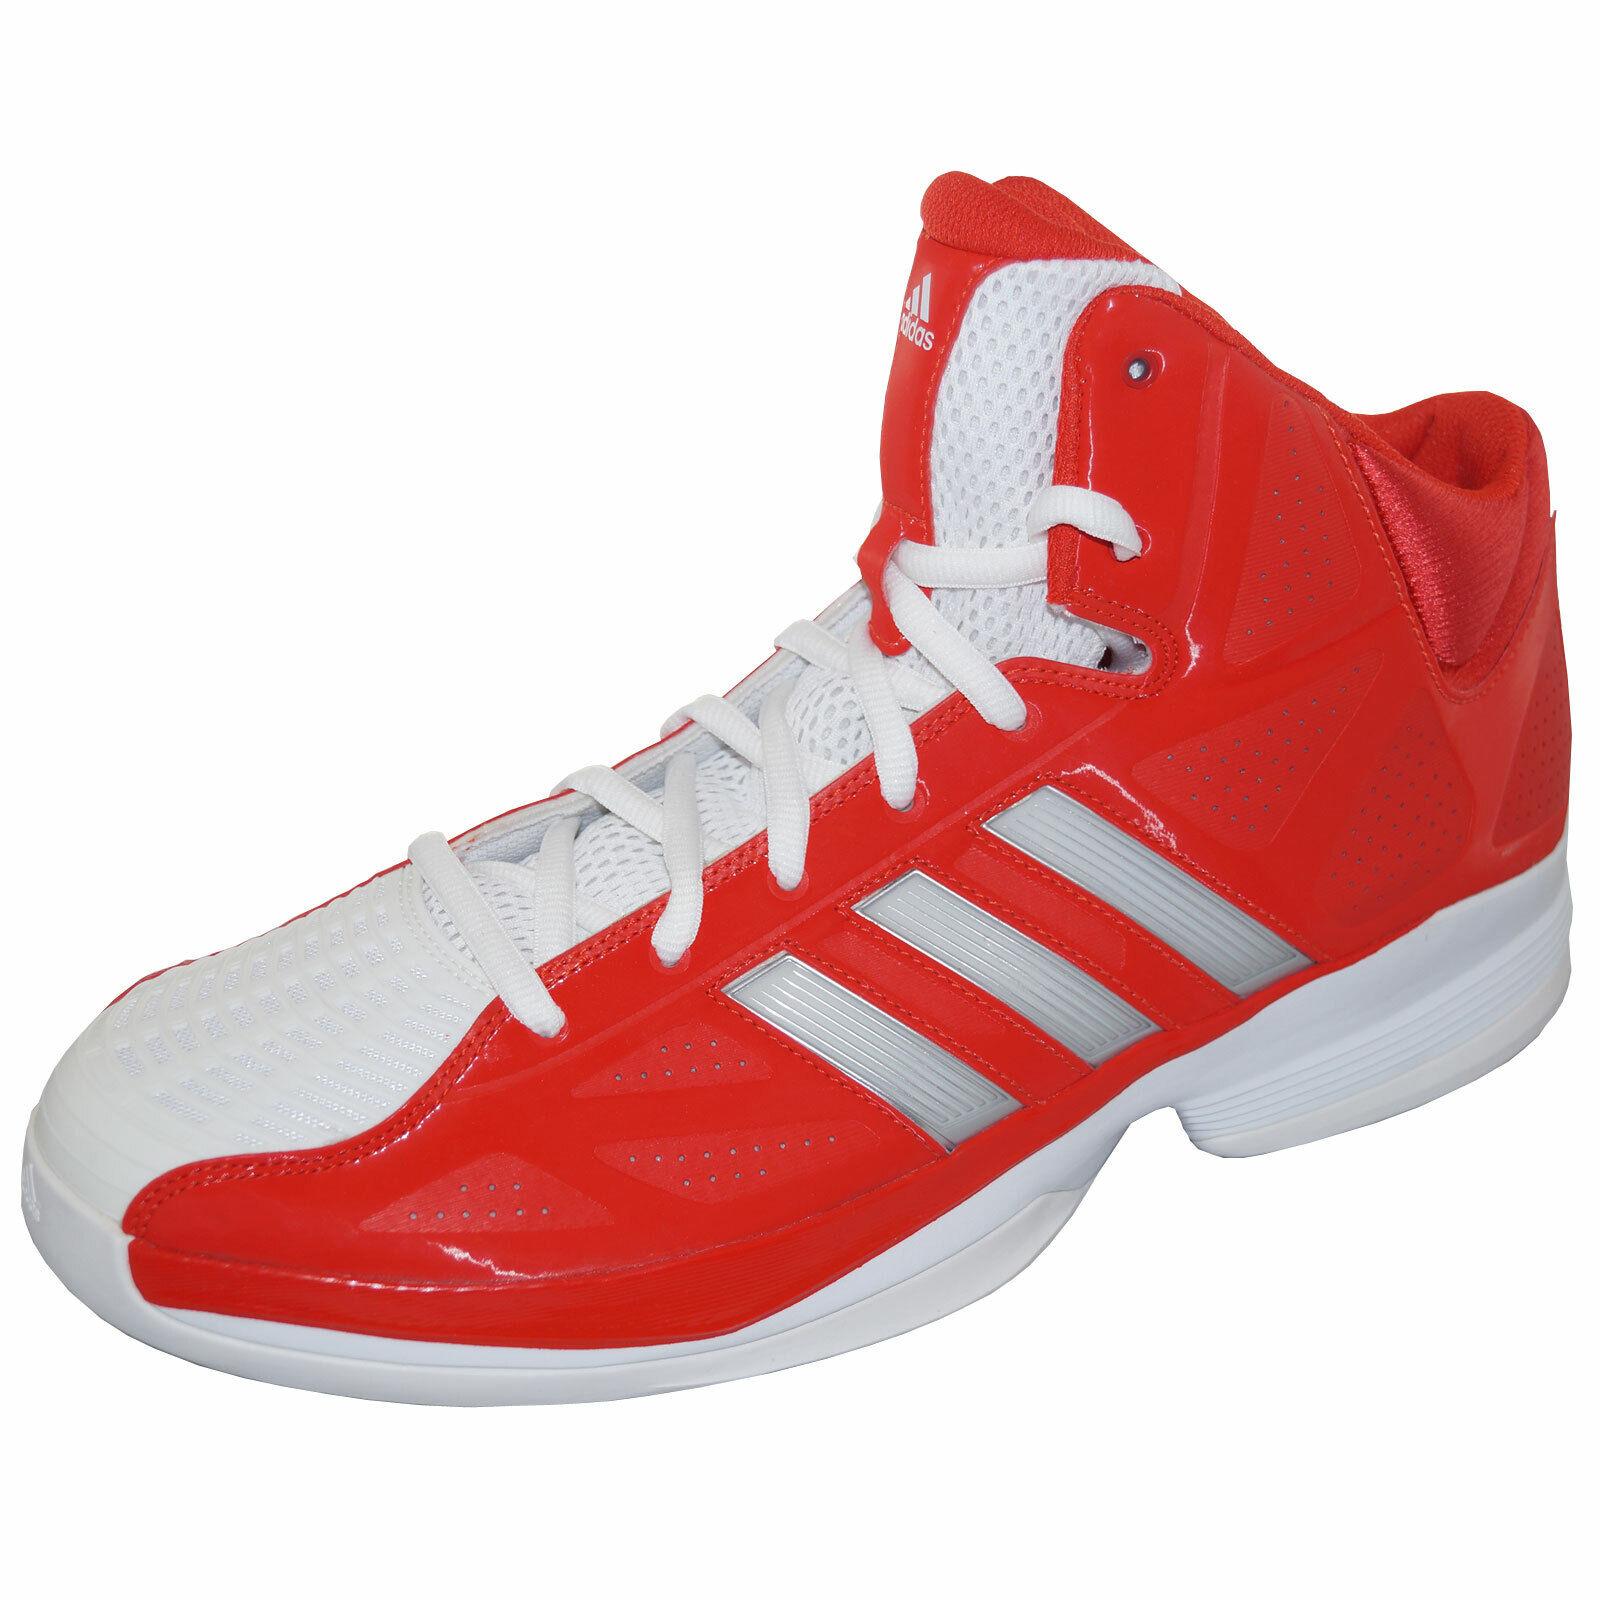 Adidas Pro Model 0 II Indoor Basketball Turnschuhe Sportschuhe Turnschuhe G47349